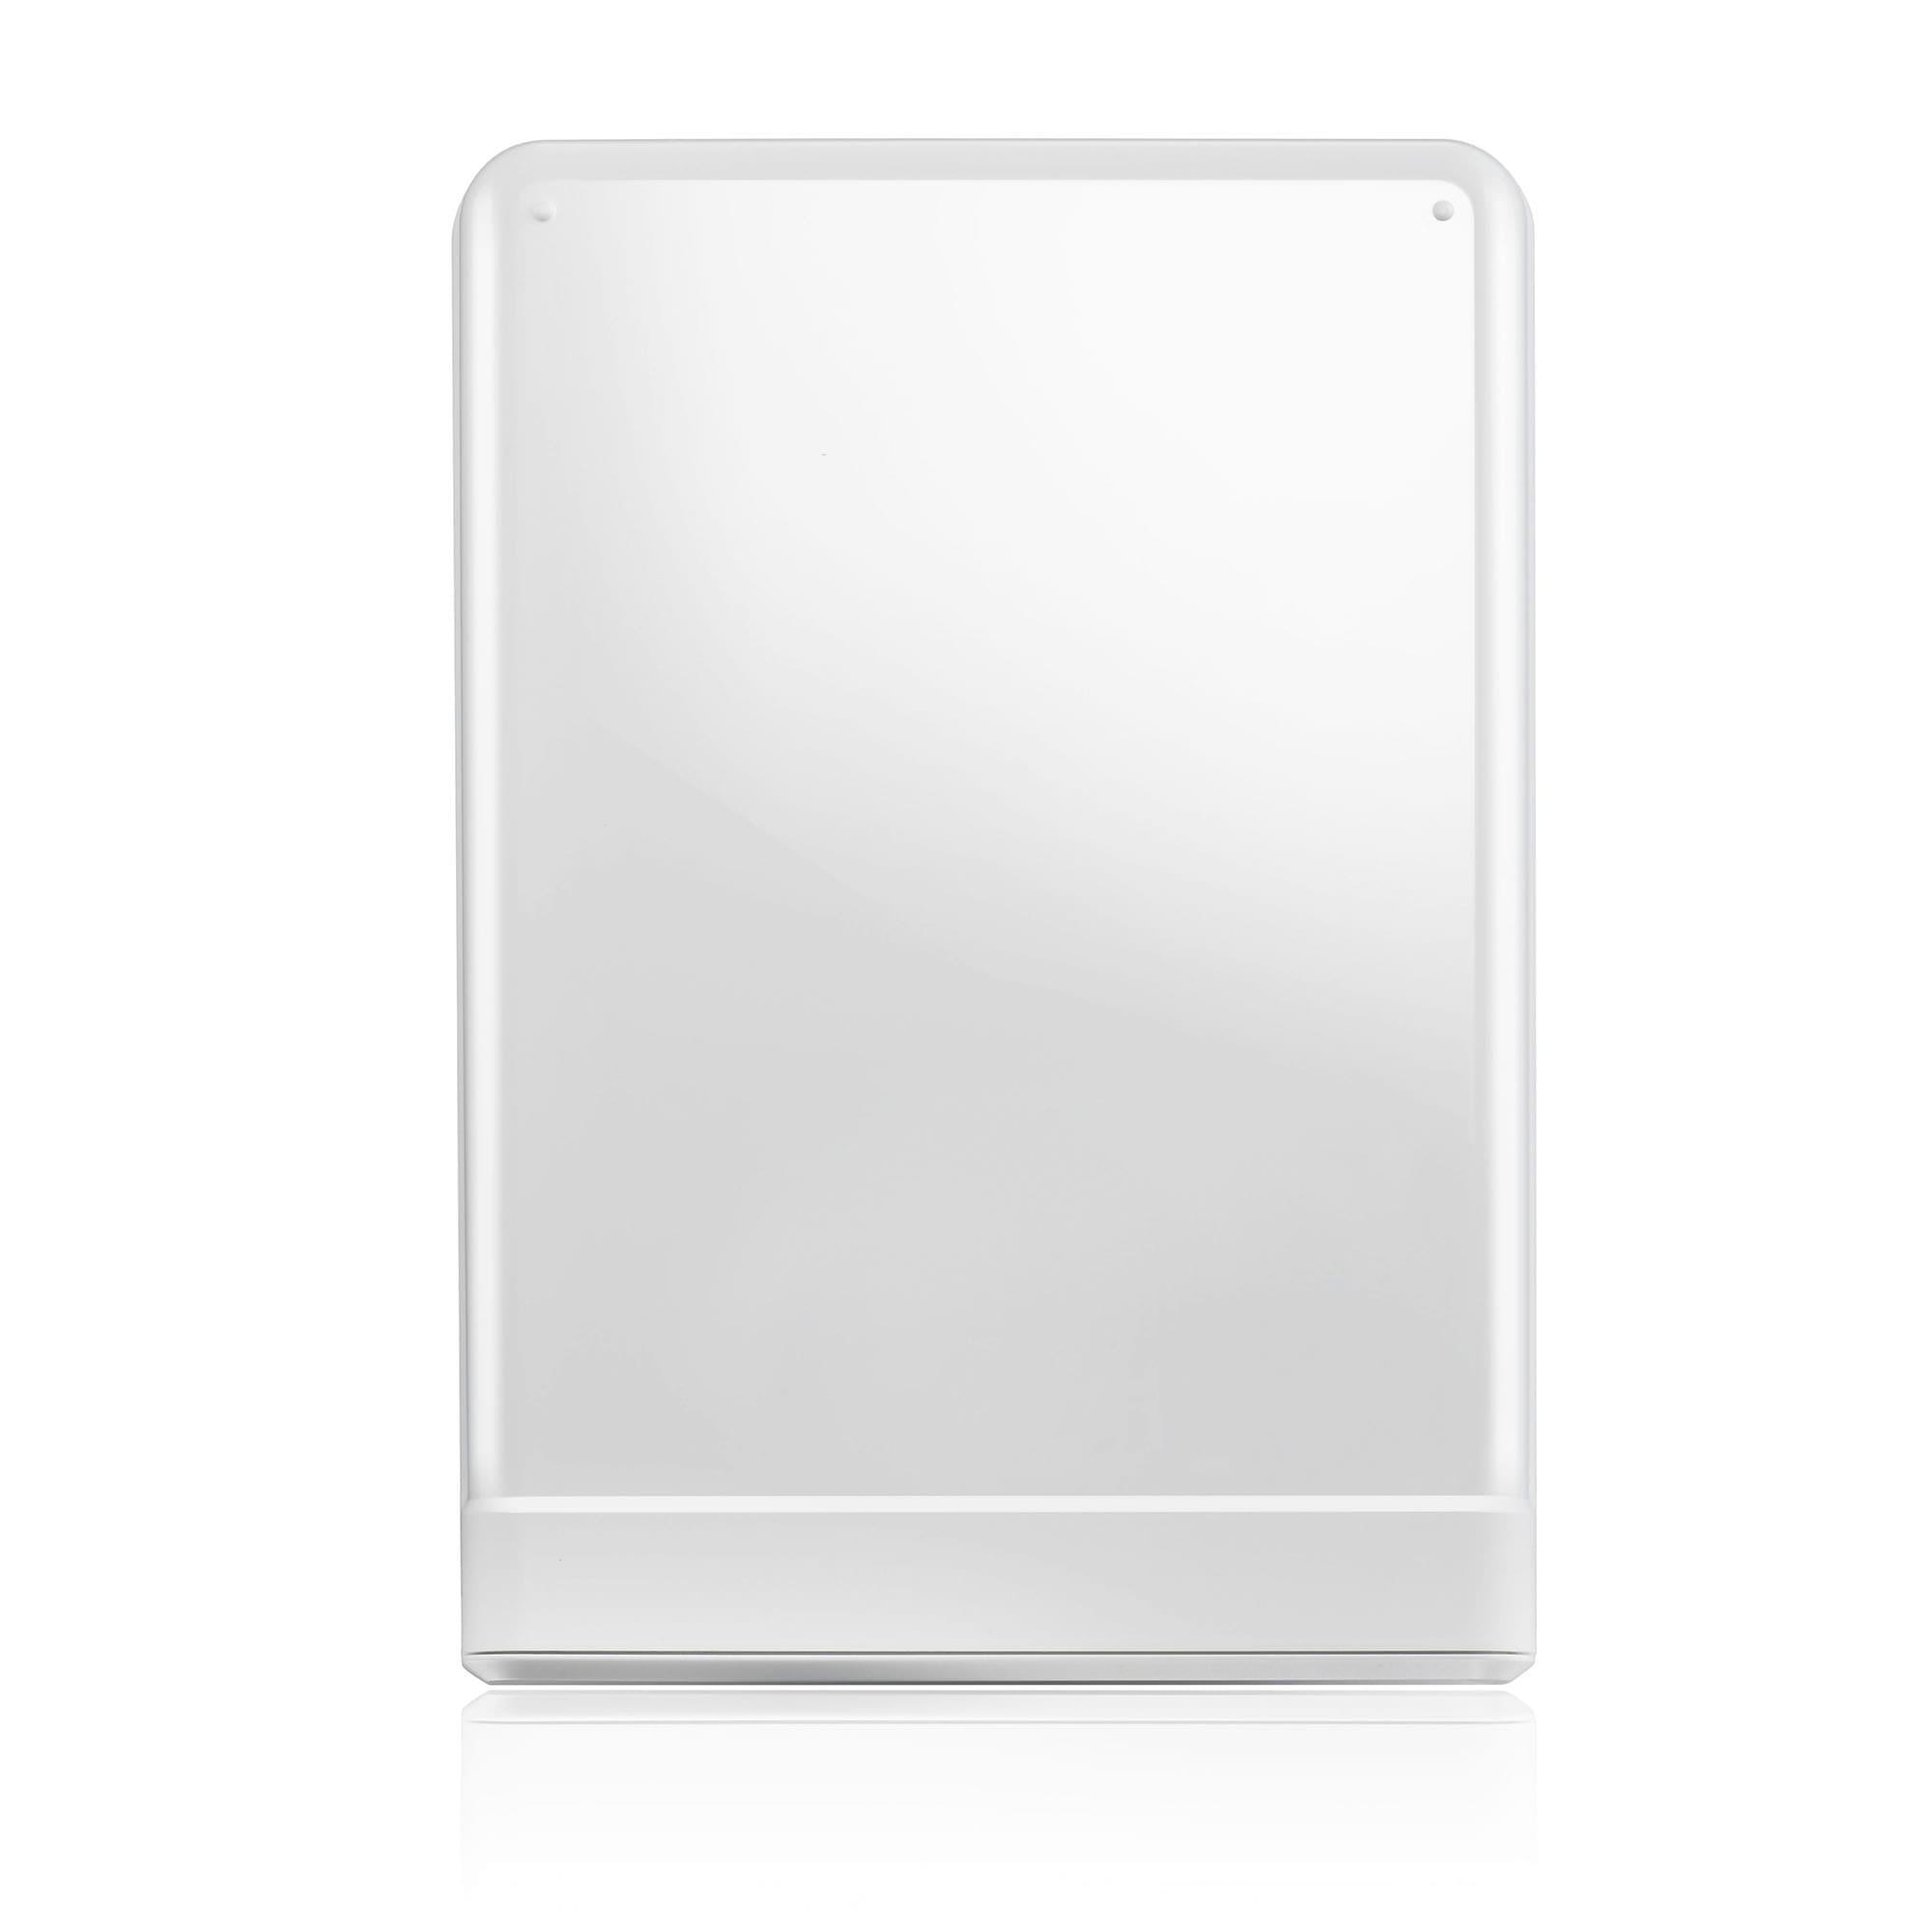 ADATA HV620S 2000GB White external hard drive